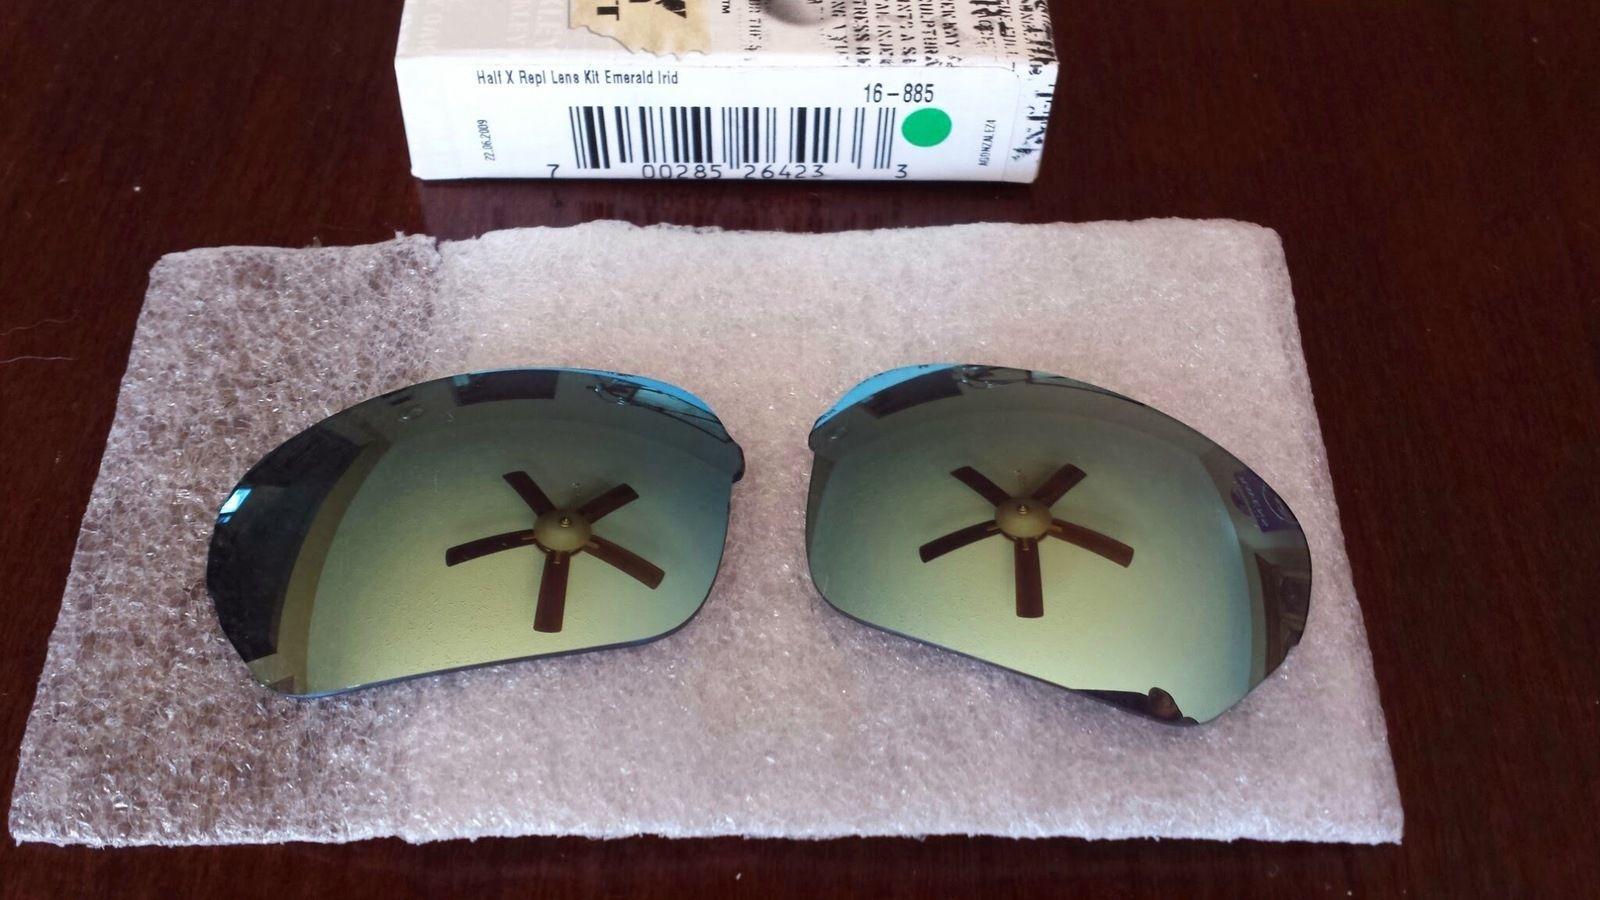 3x Half-X Lenses (Emerald, Ruby, VR28) - 20140320_153040.jpg